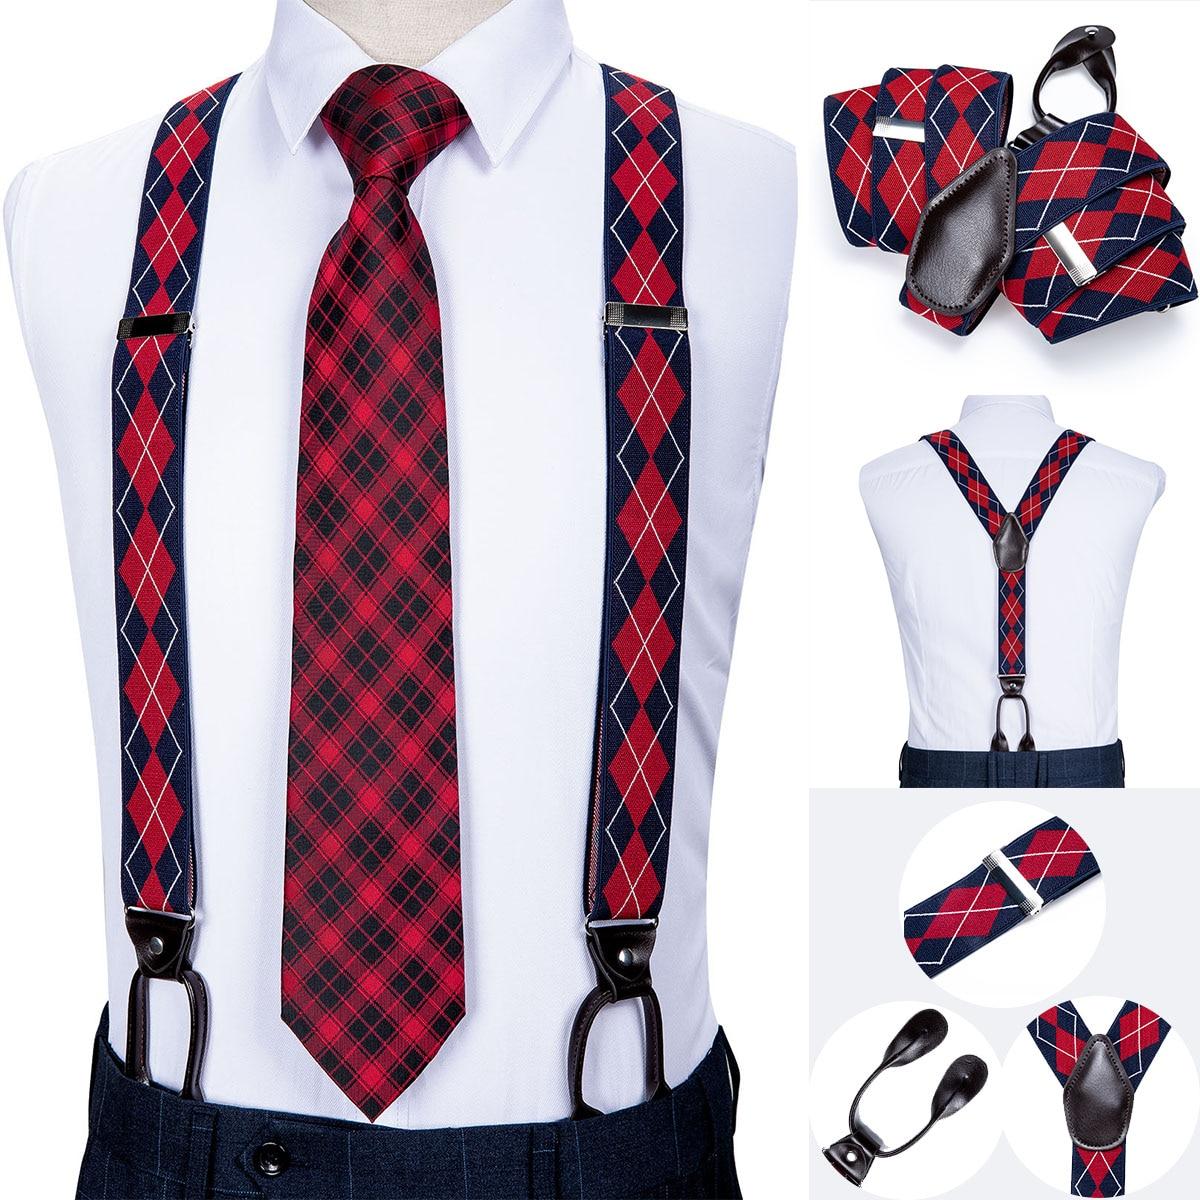 New in box Men/'s Suspender metallic silver elastic braces clips buttons